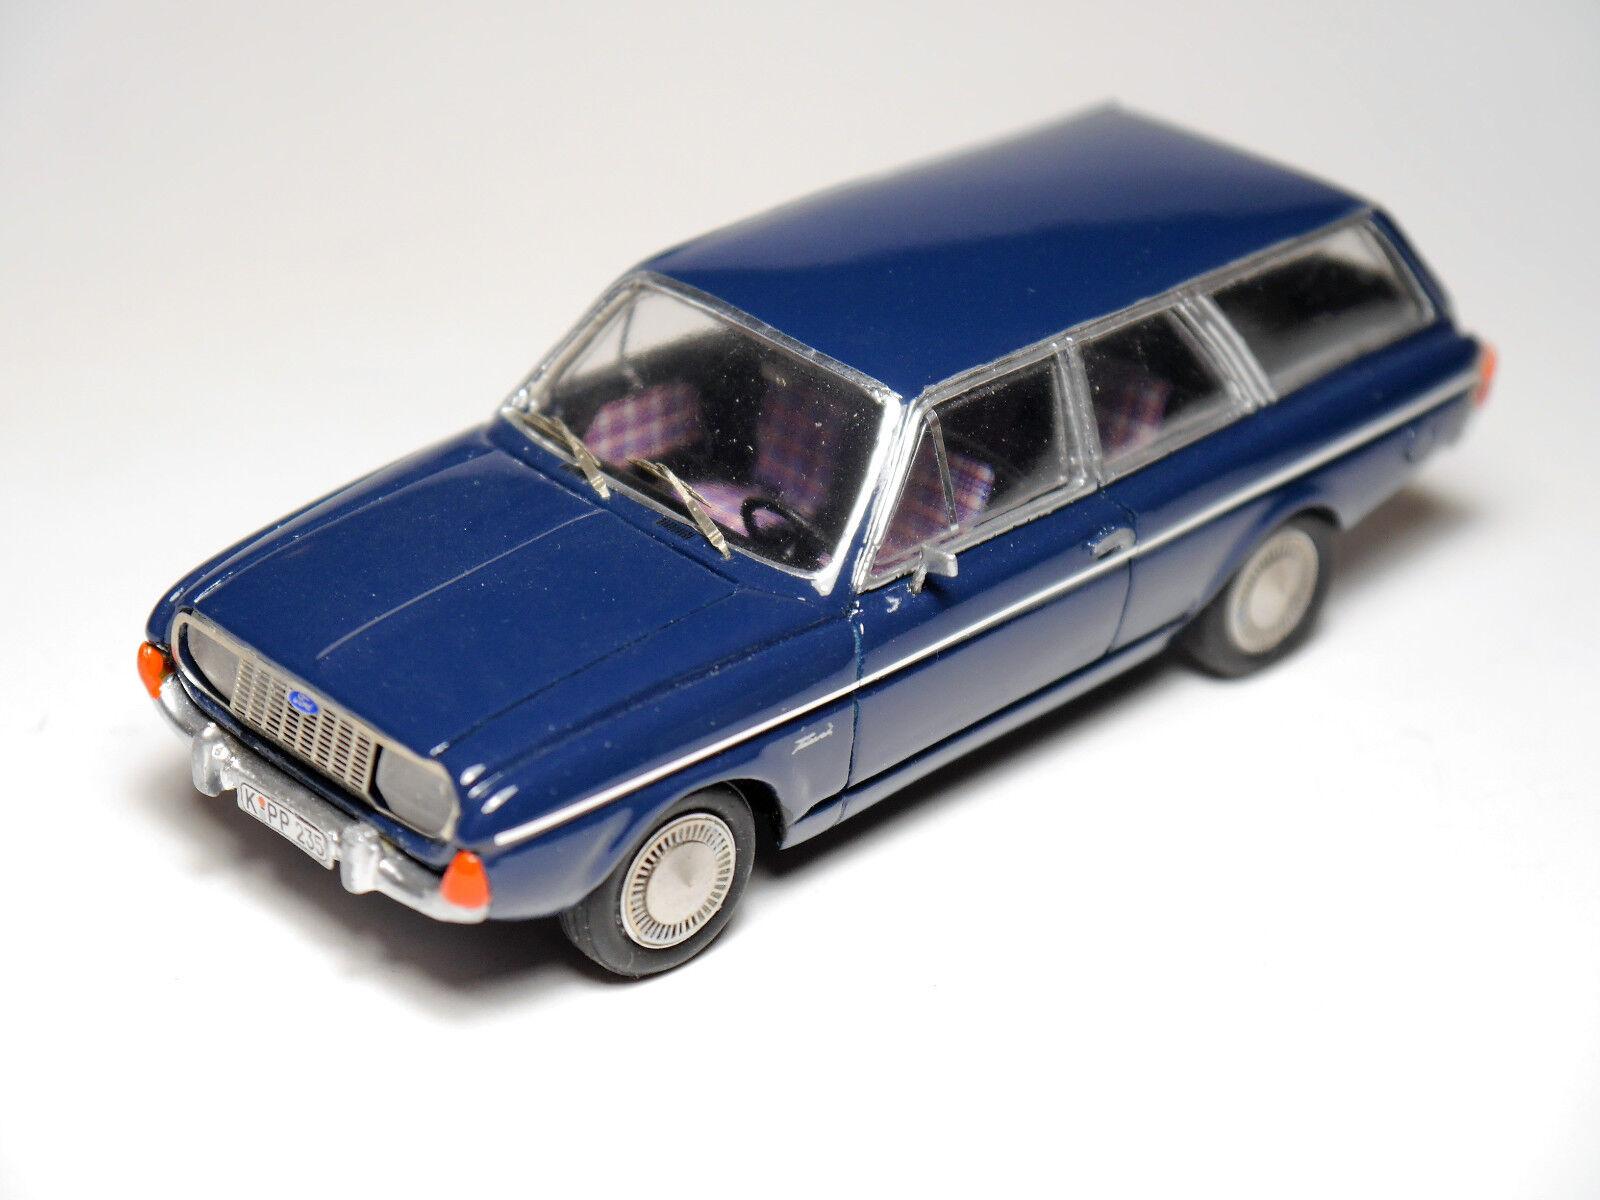 Ford Taunus 20 M Turnier in blue bluee, Handarbeit handamde Paradcar in 1 43